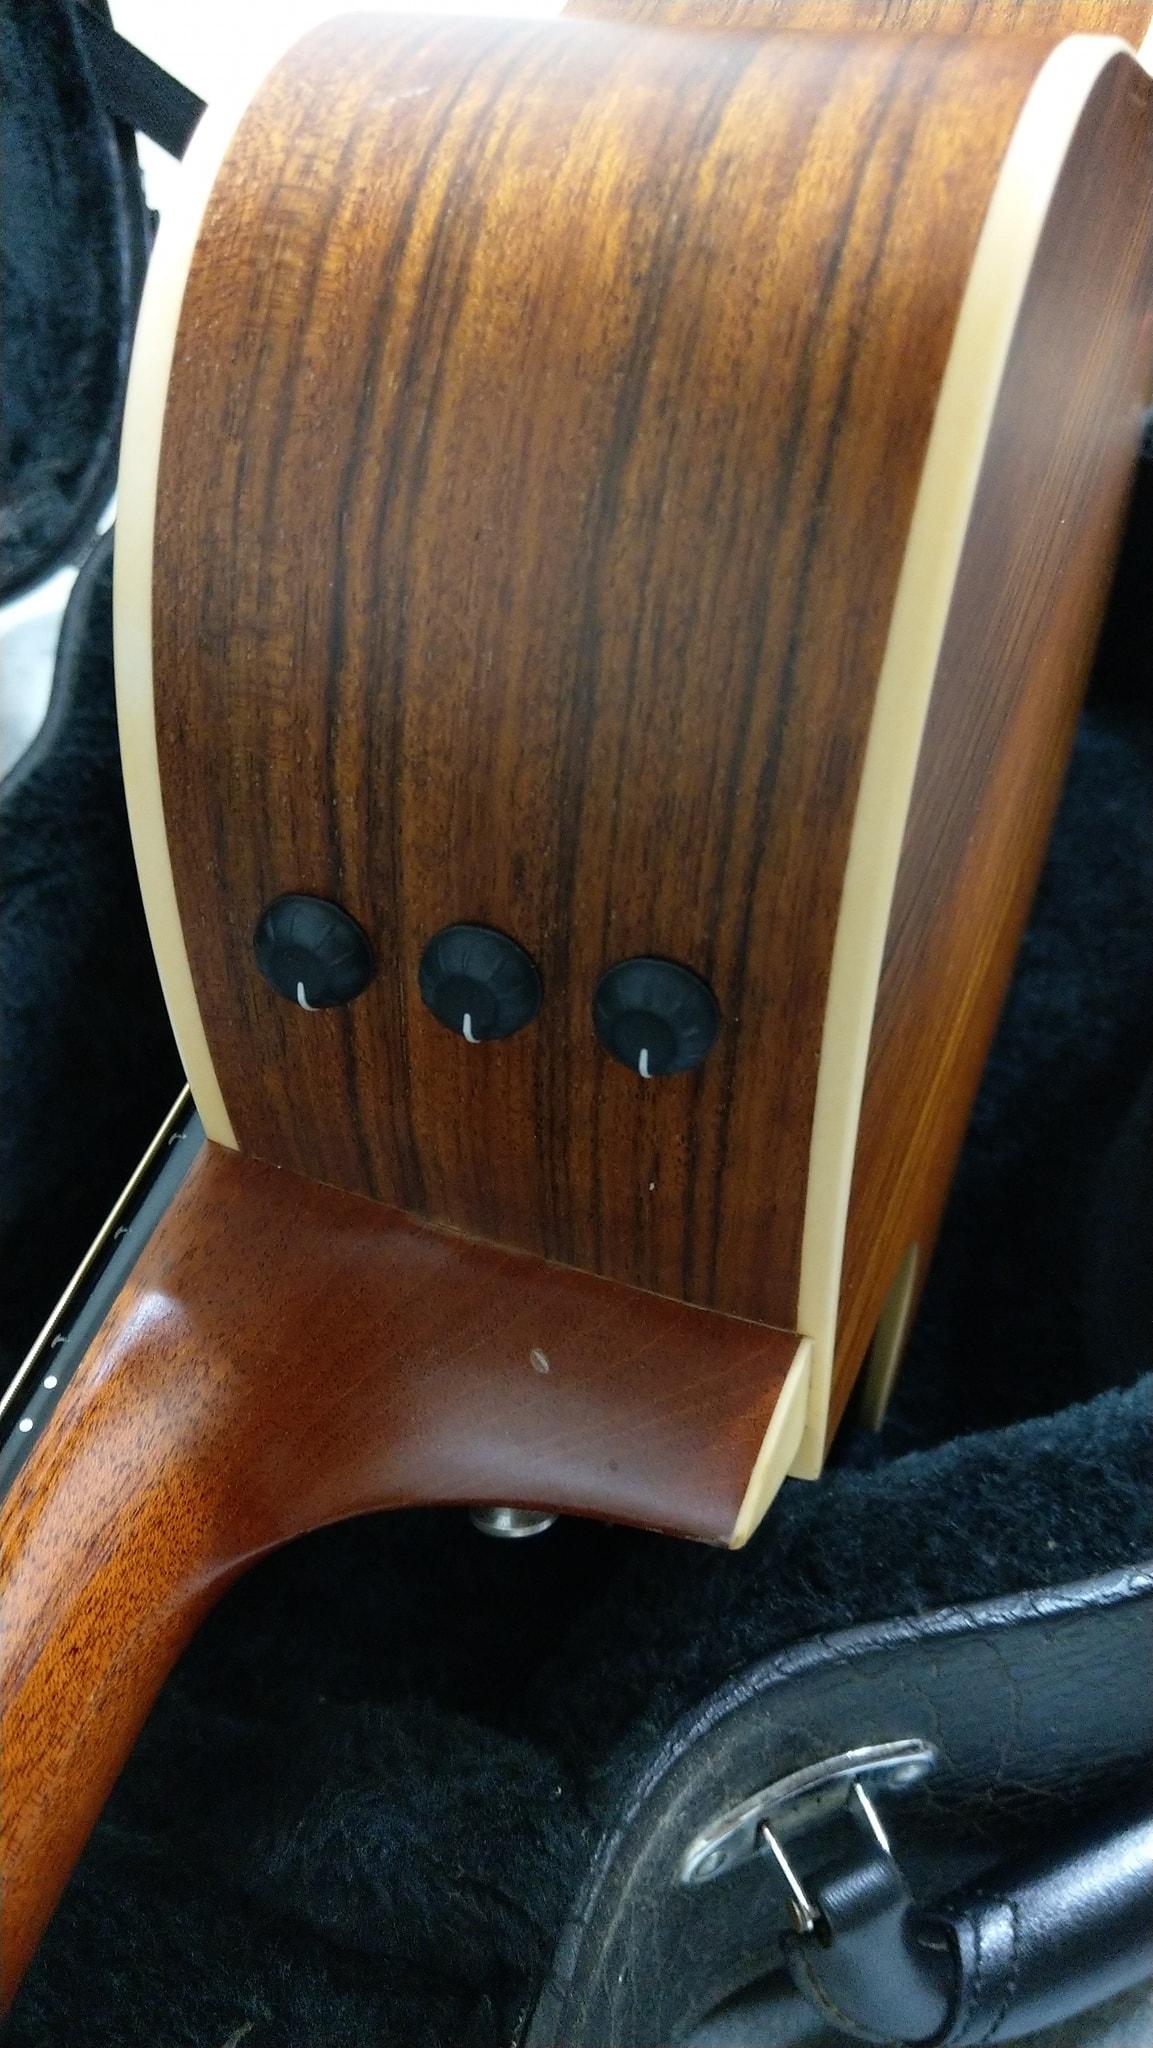 Taylor 414ce 美廠全單板電木吉他